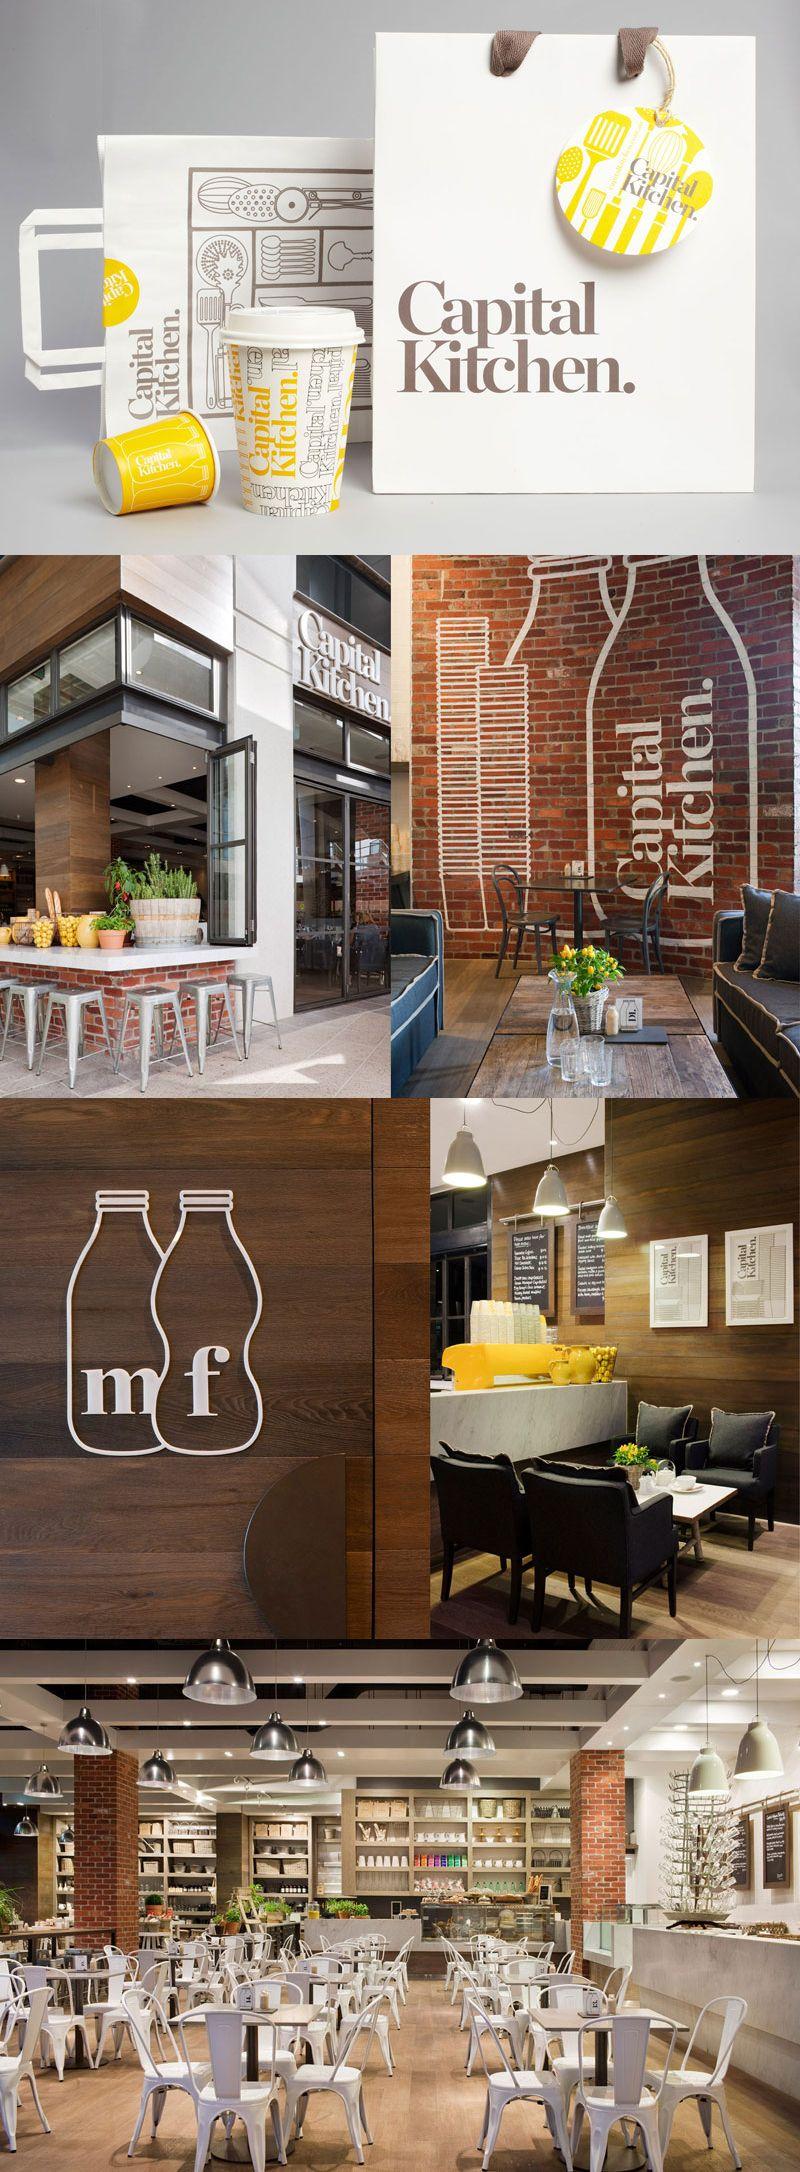 Capital Kitchen by Cornwell Branding & Design Branding